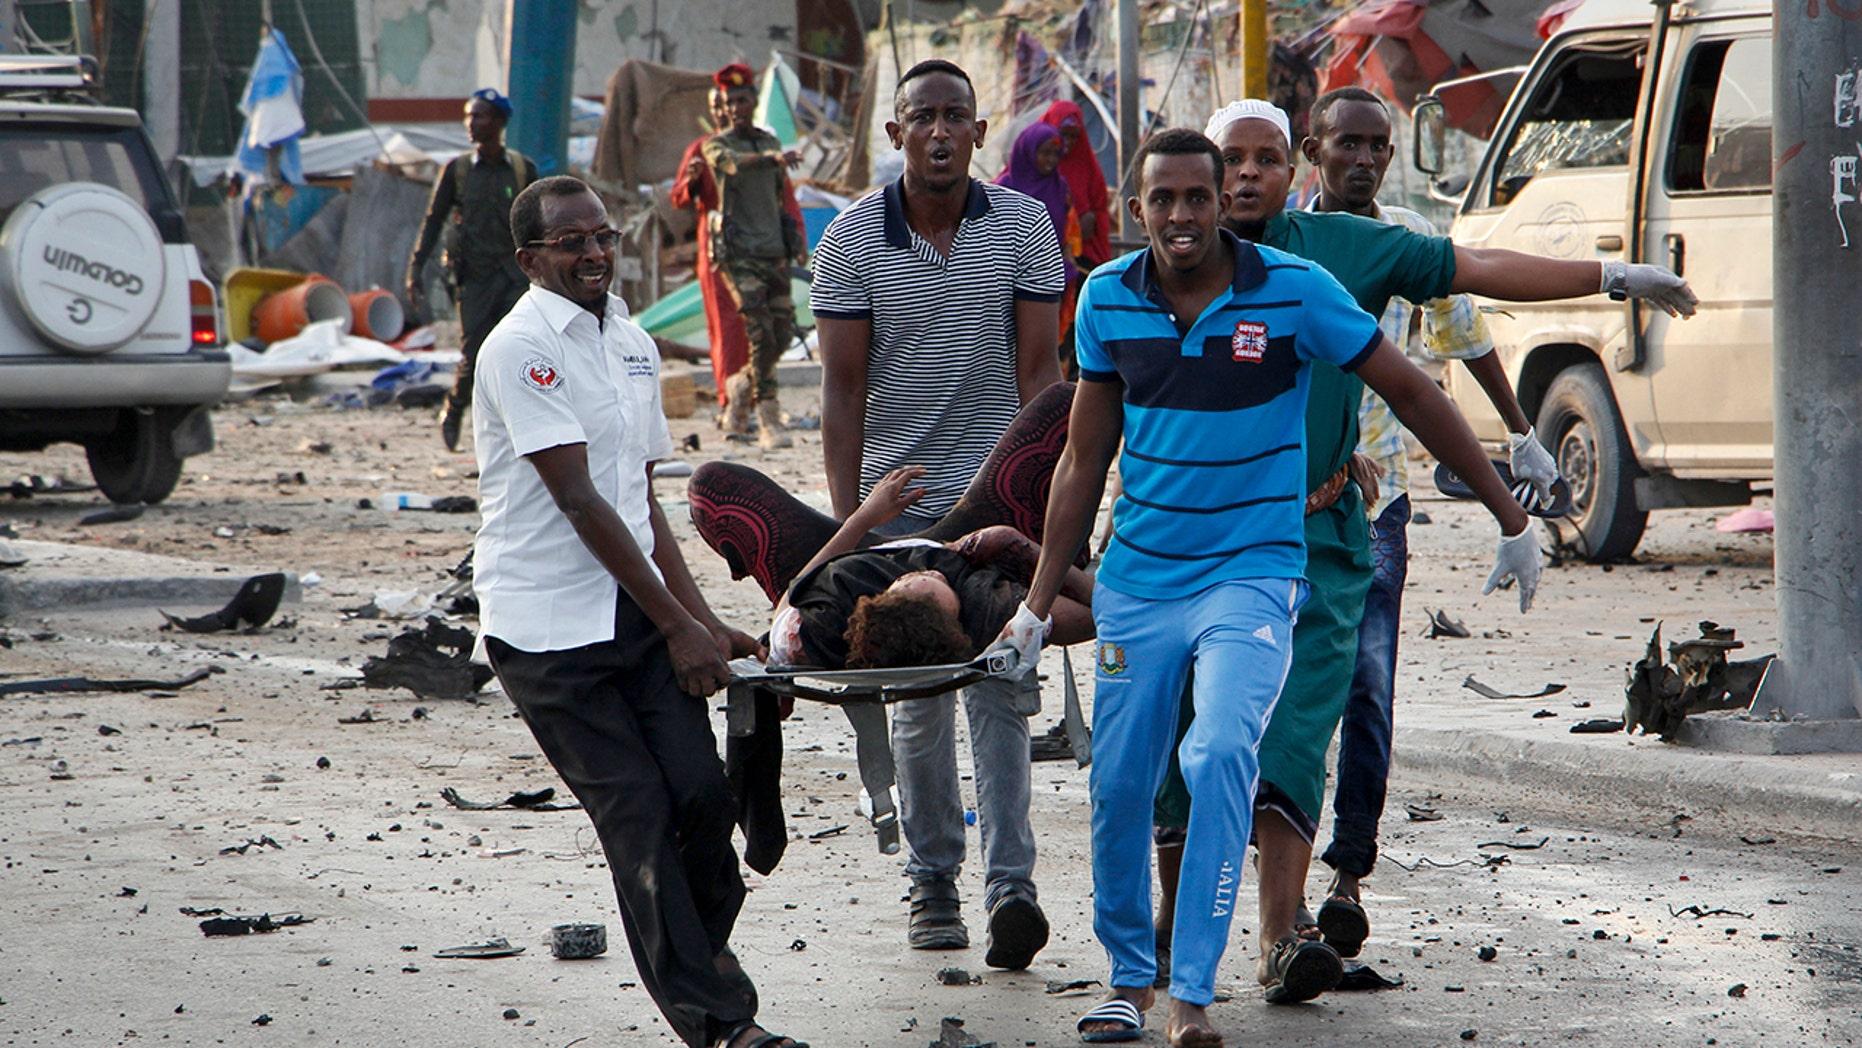 Somalis carry away an injured civilian who was wounded in a bomb blast near the Sahafi hotel in the capital Mogadishu, Somalia.